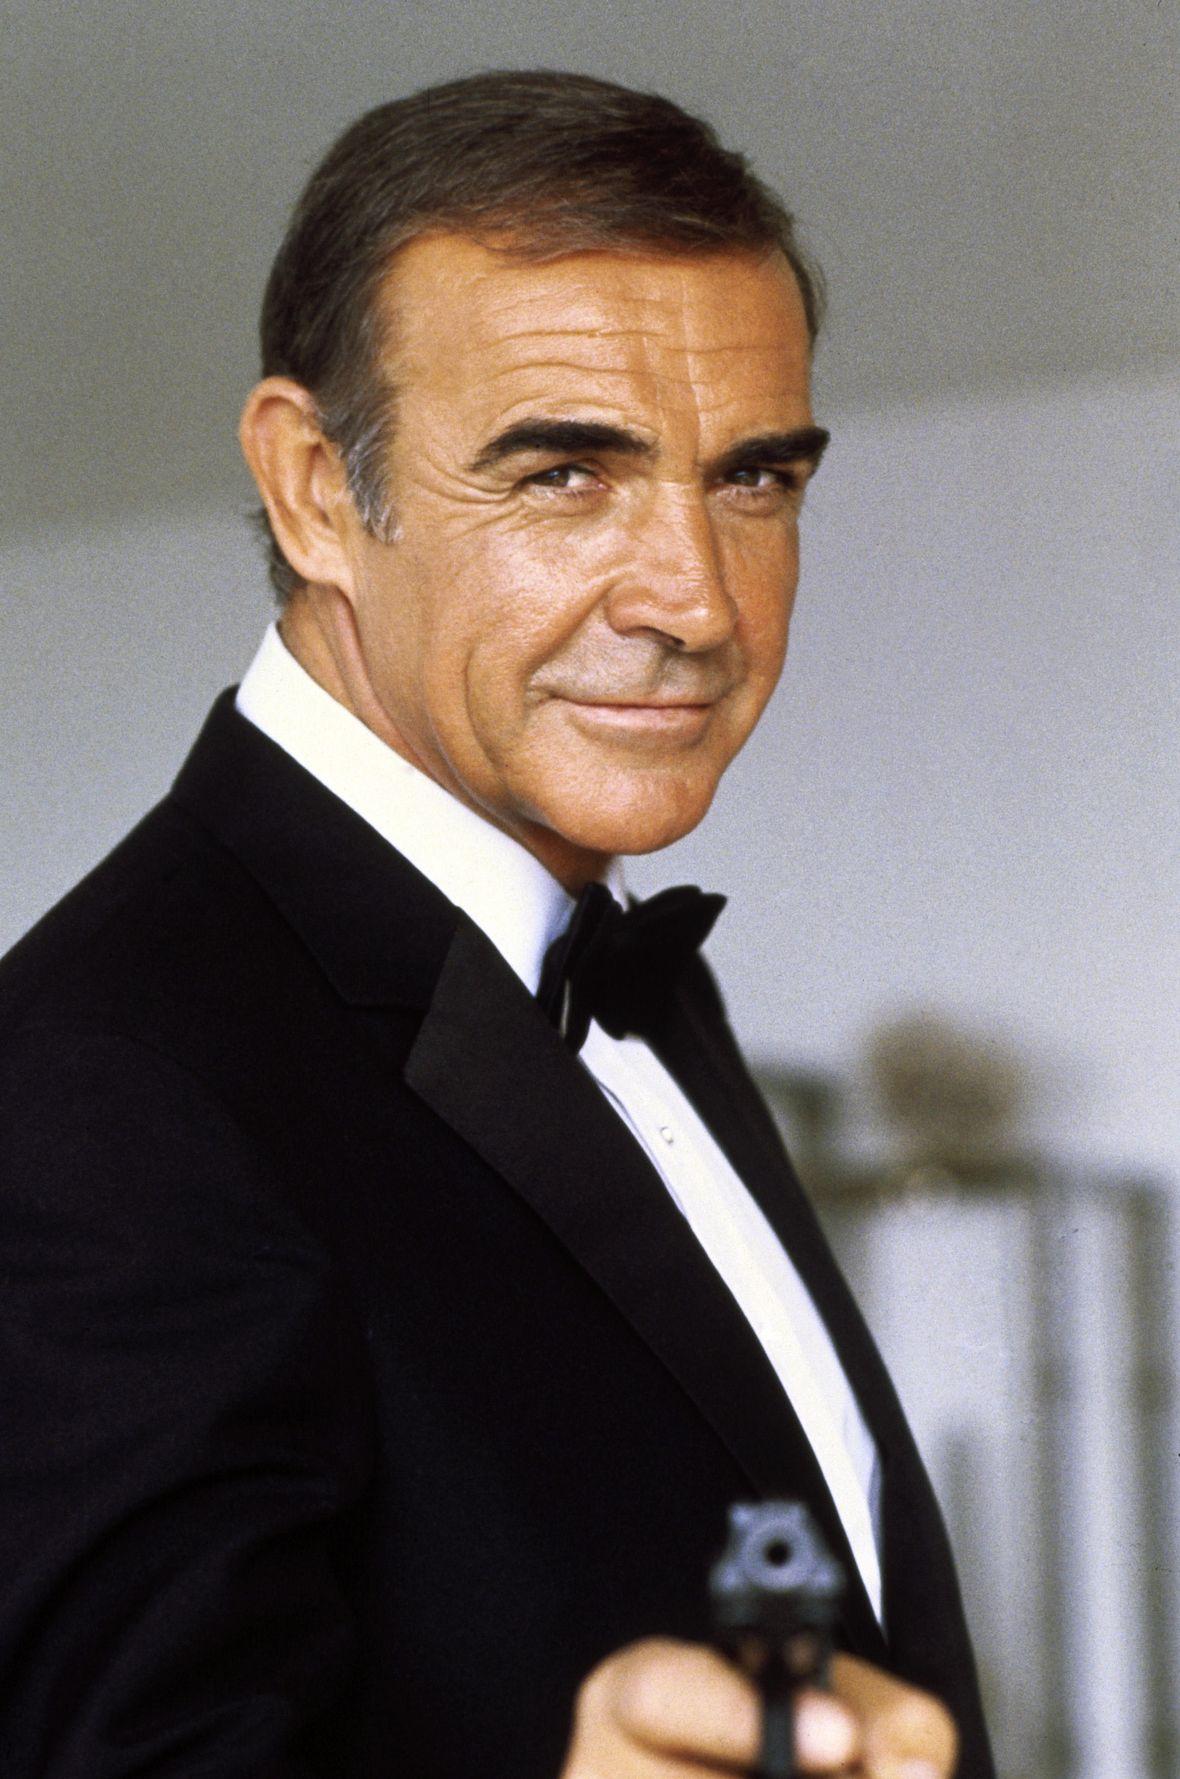 Best James Bond Actor Sean Connery